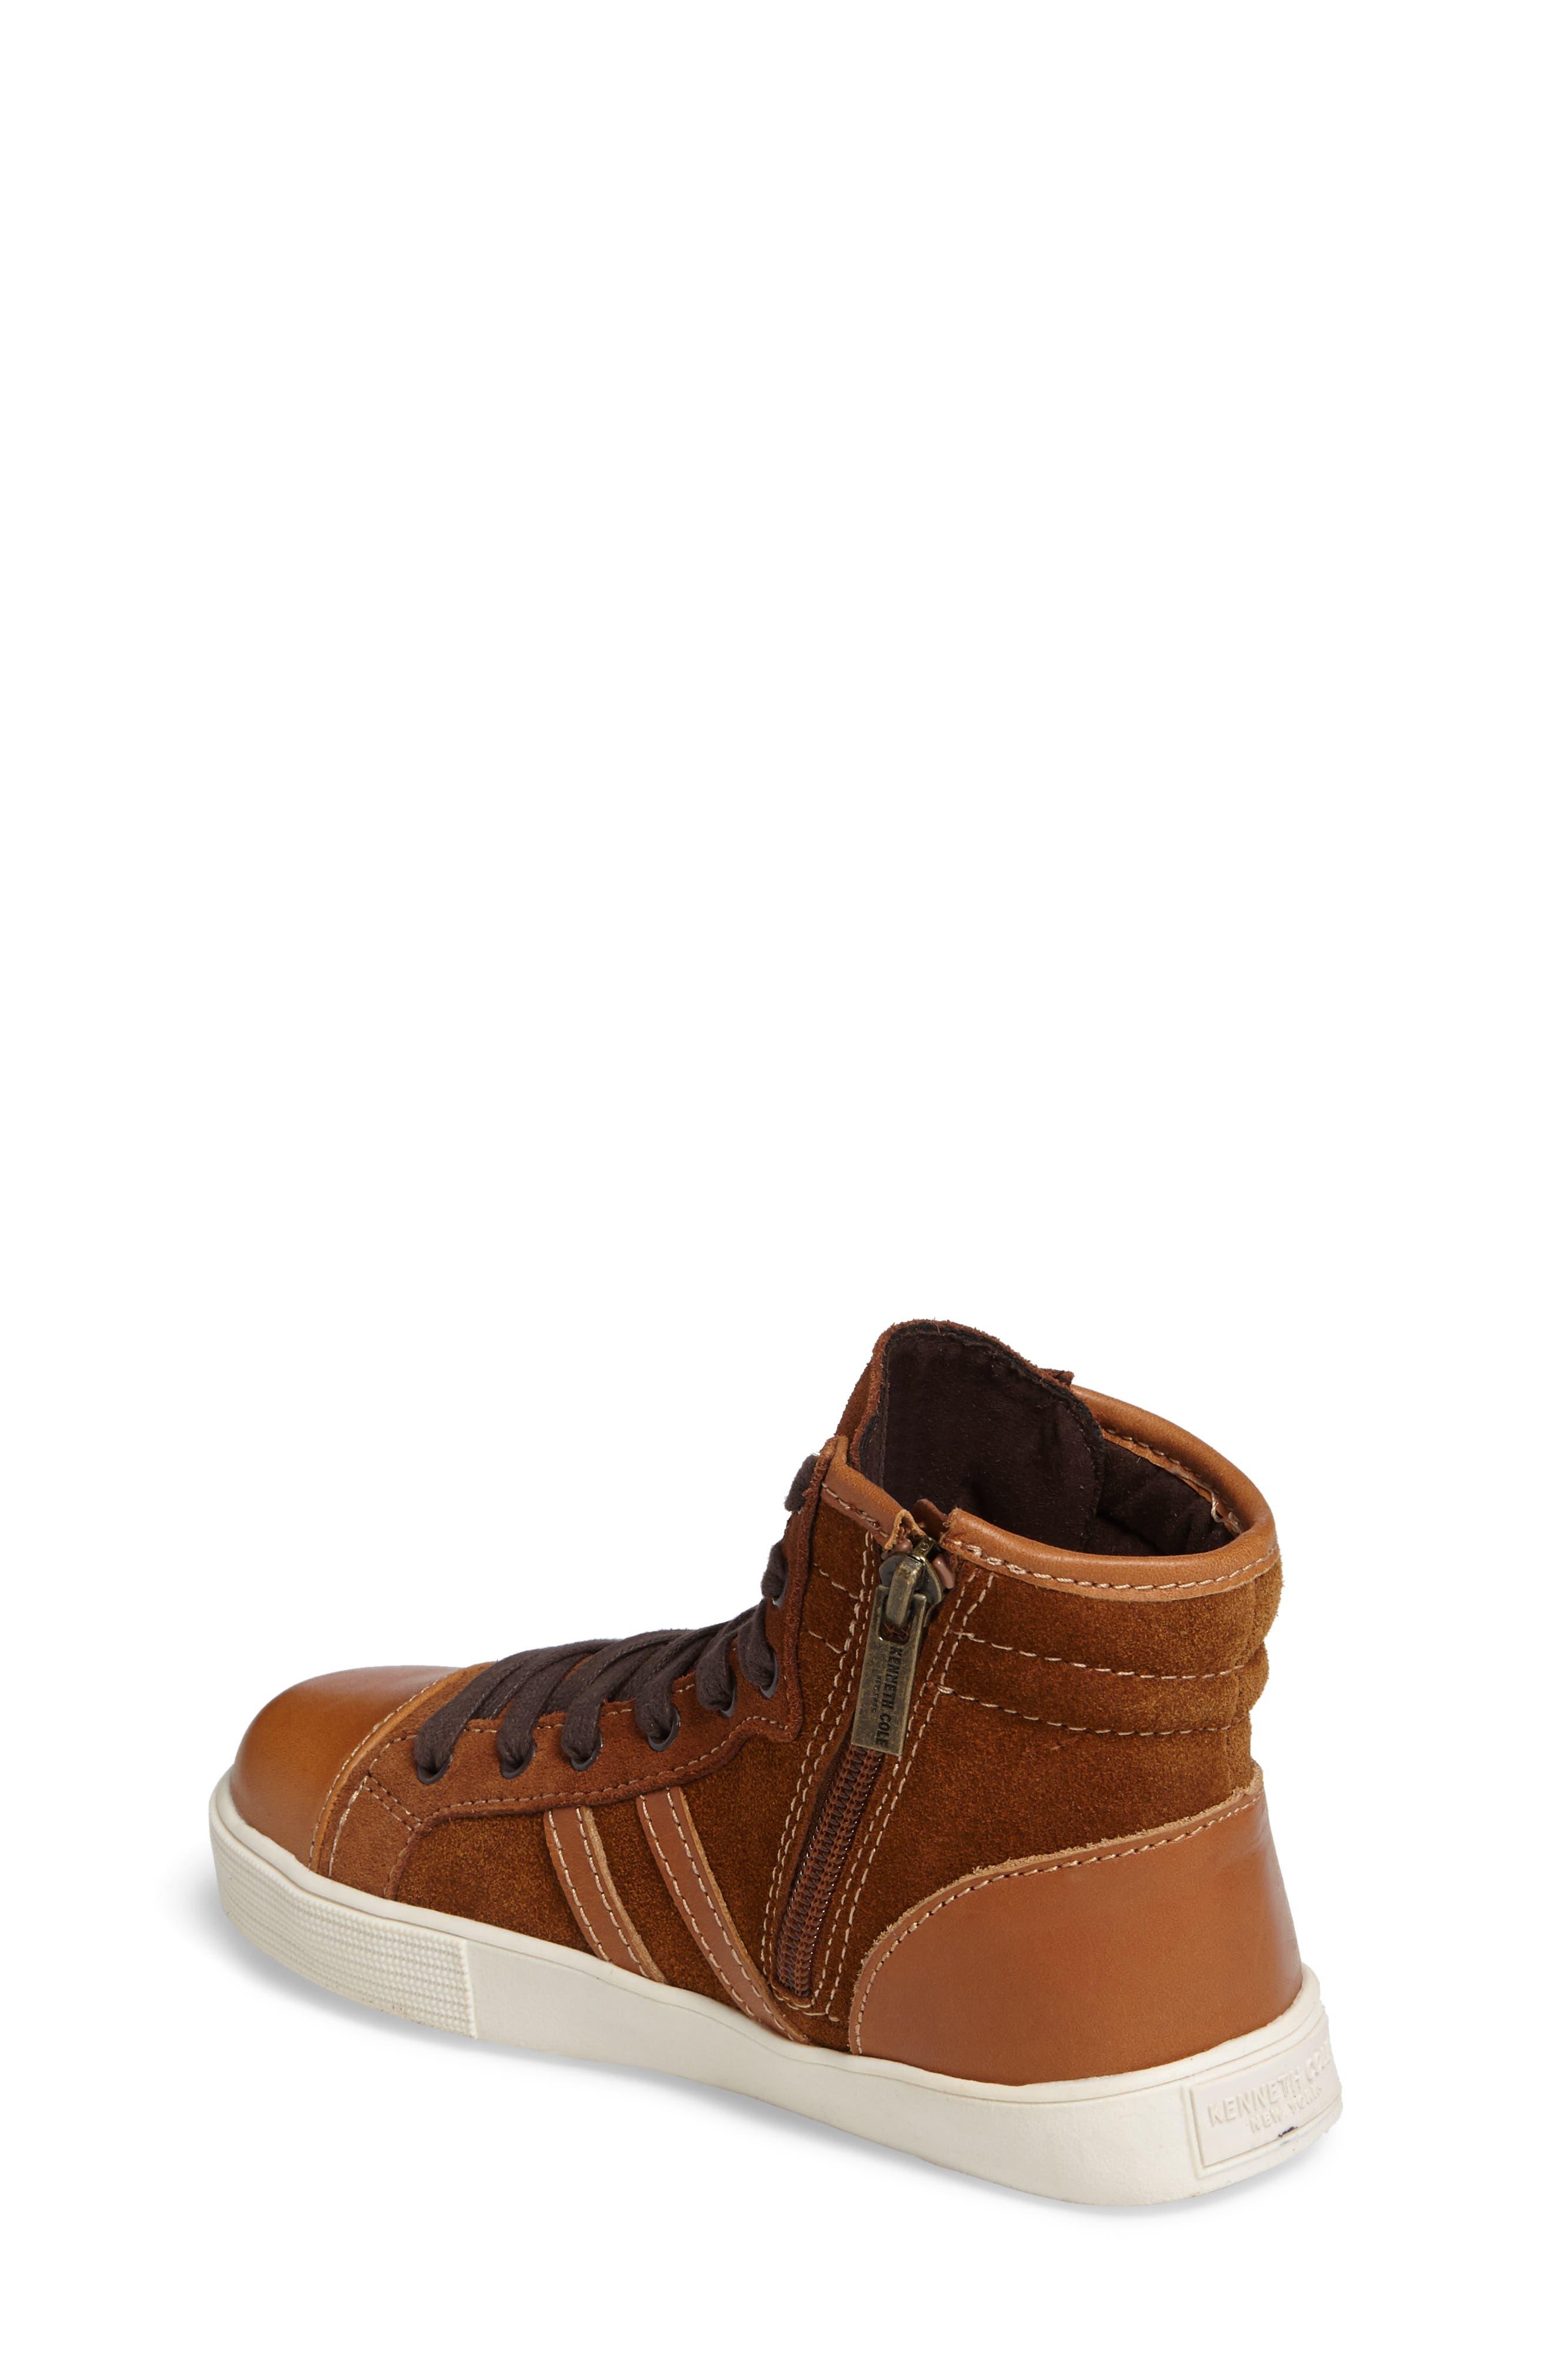 Jay Top High-Top Zip Sneaker,                             Alternate thumbnail 2, color,                             205